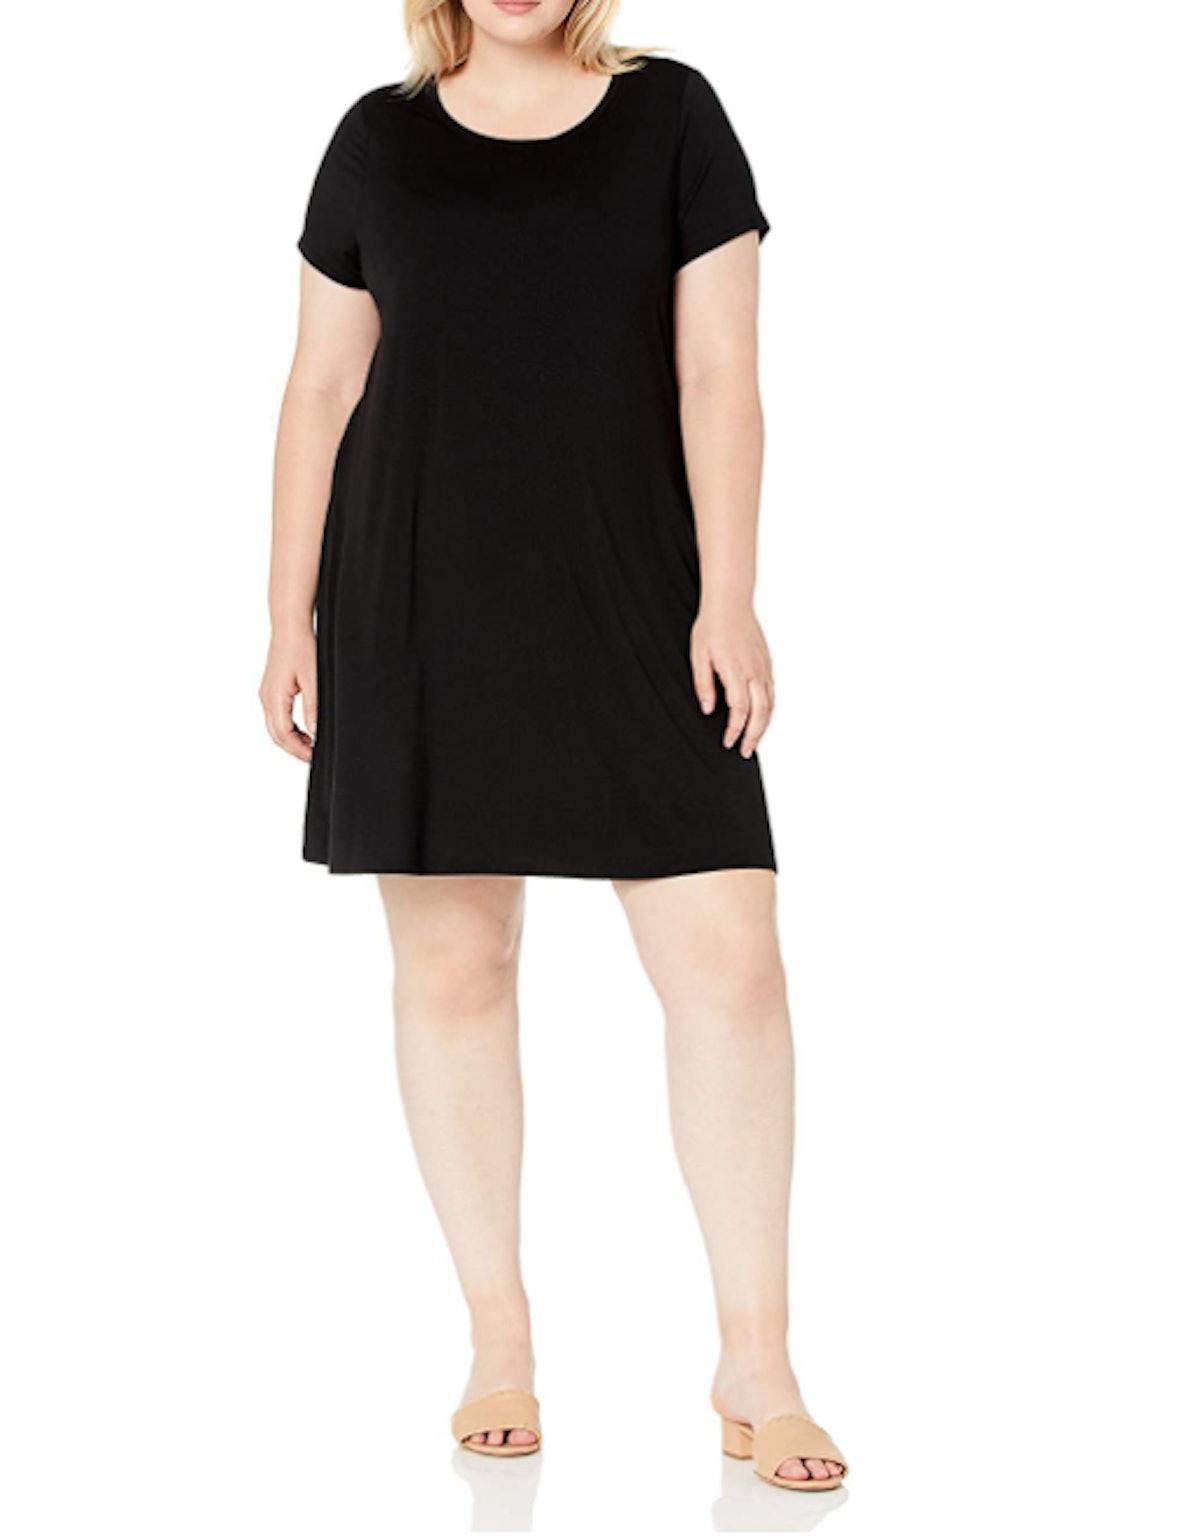 Amazon Essentials Plus-Size Short-Sleeve Swing Dress